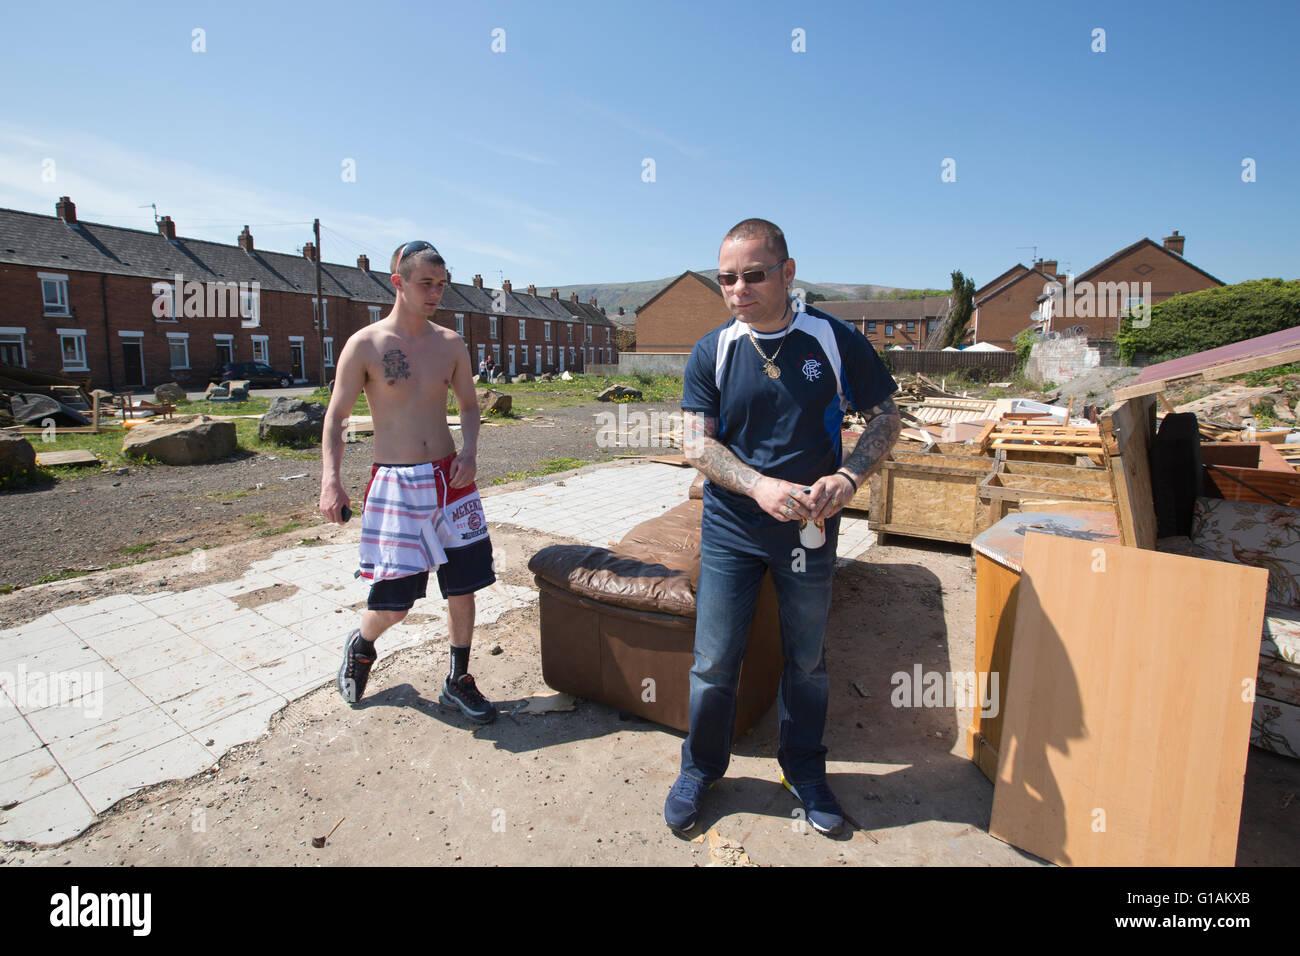 Protestant community on Shankill Road area of Belfast, Northern Ireland, UK - Stock Image